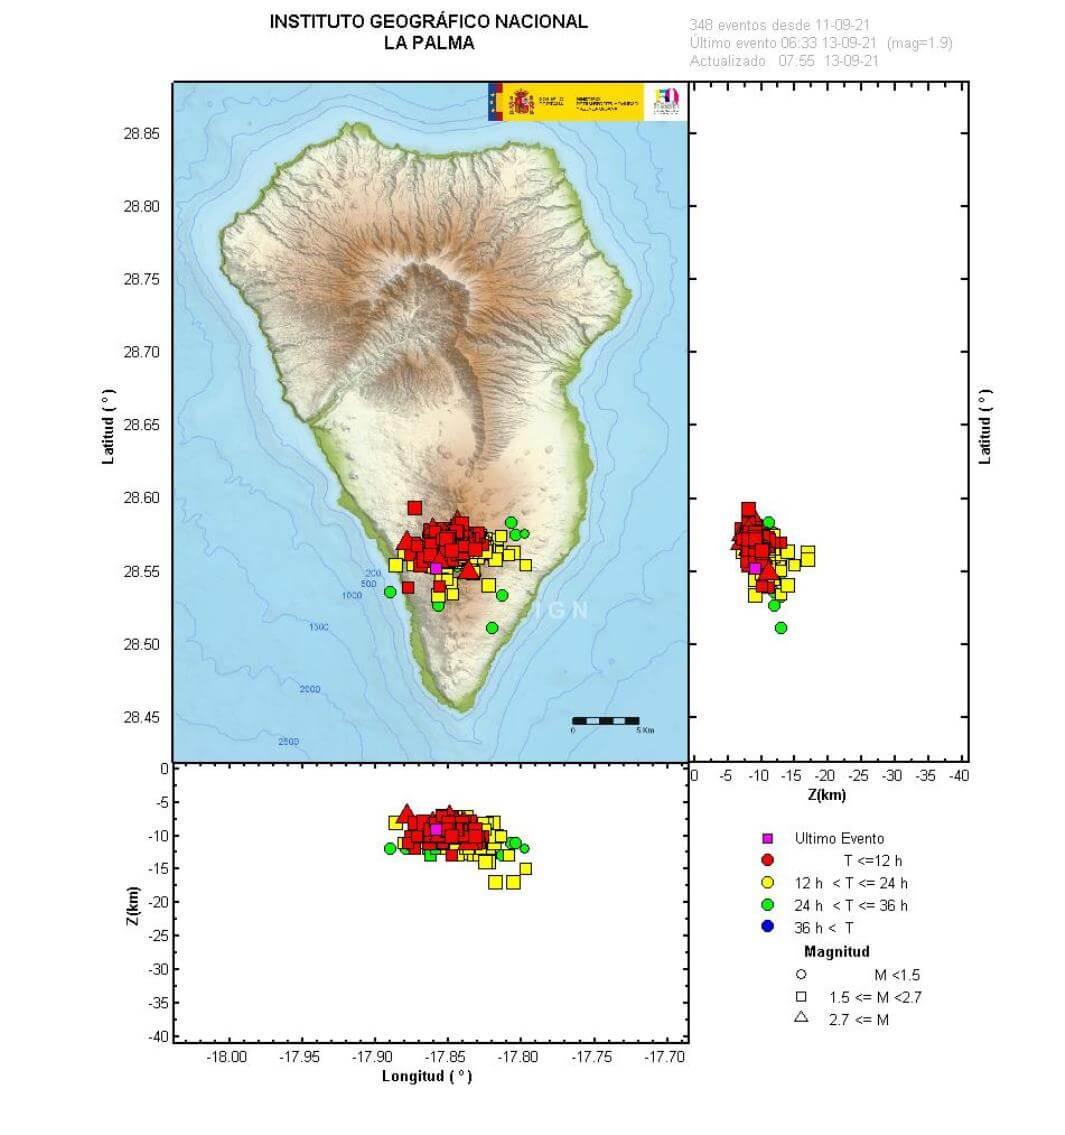 la-palma-volcano-canary-islands-eruption-2021-earthquakes-seismic-crisis